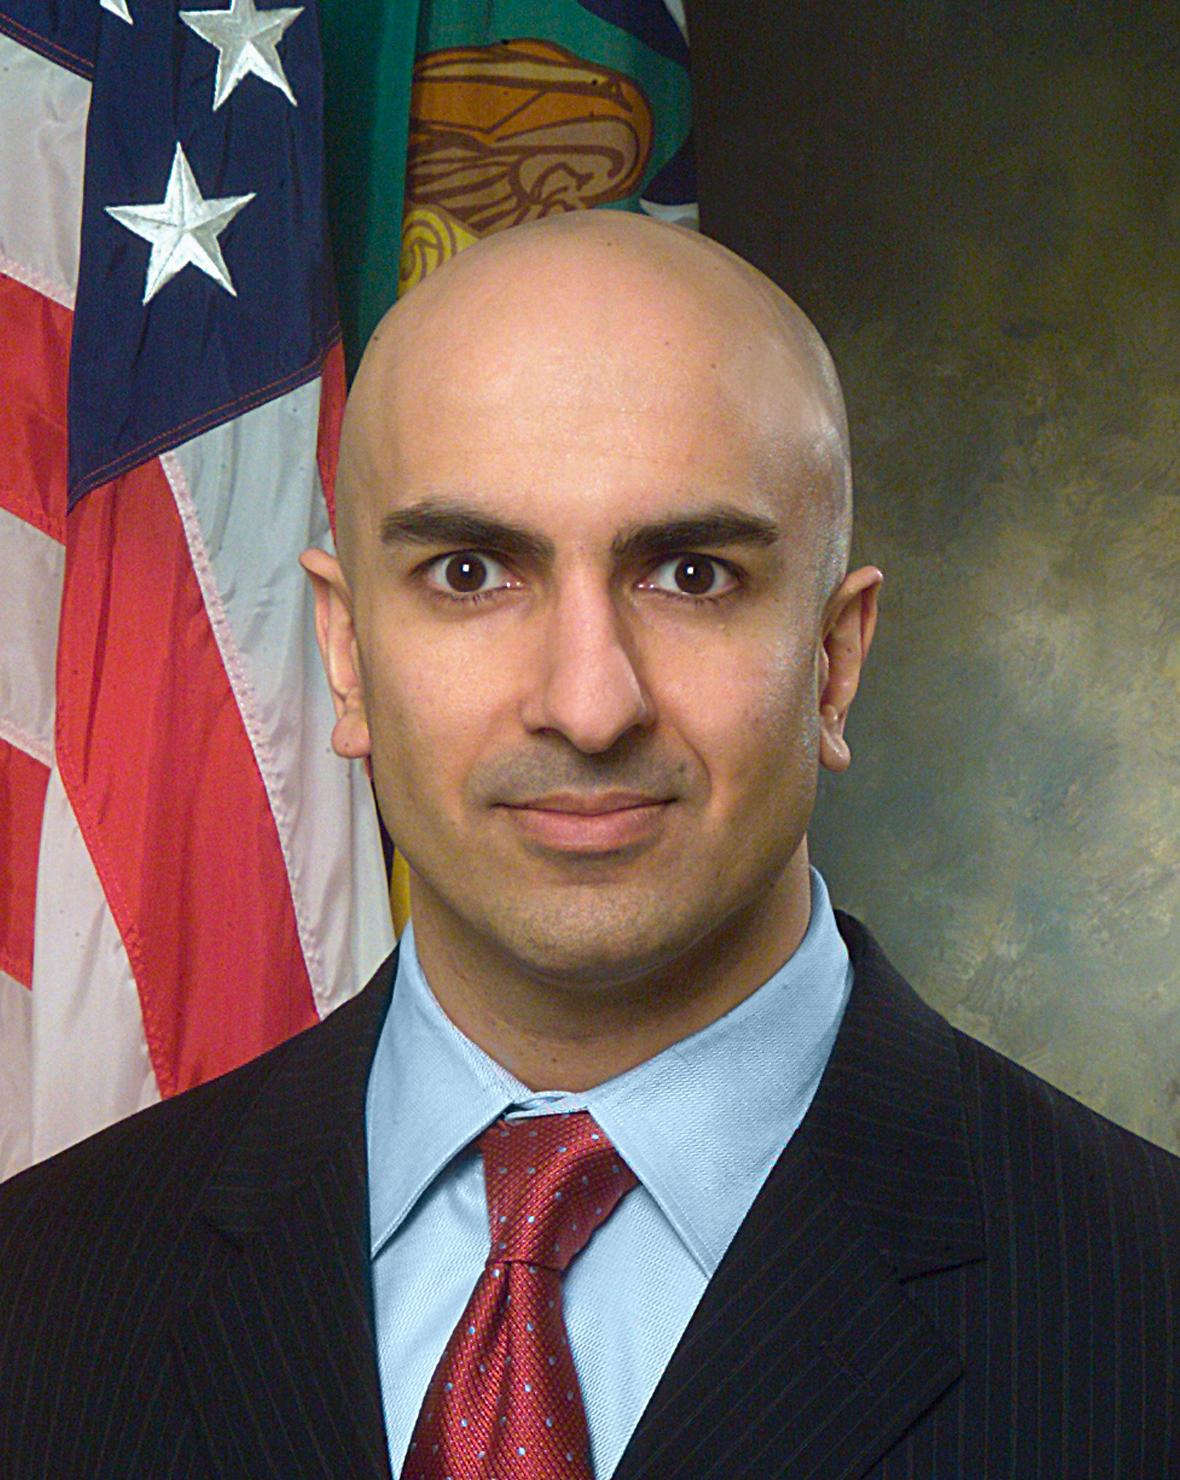 Re: [爆卦] Fed's Kashkari: Fed有無限現金